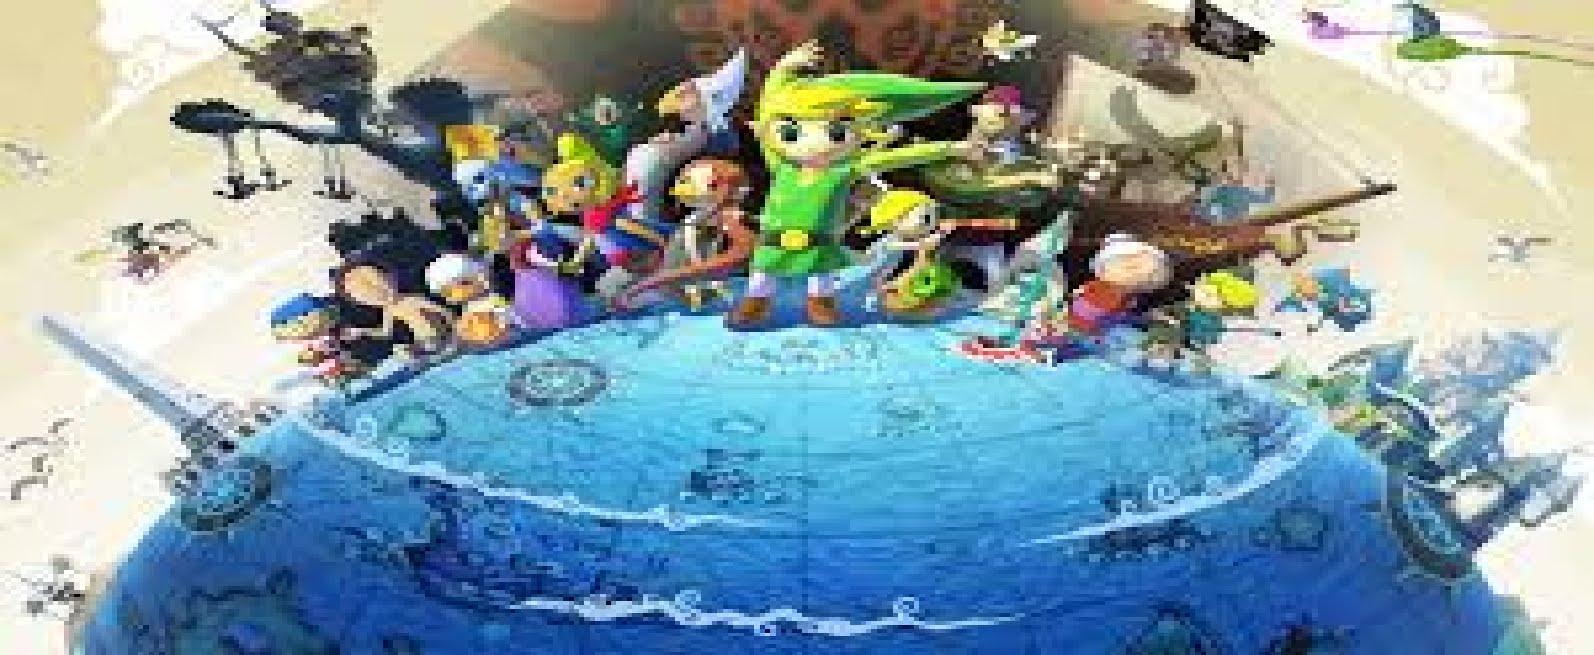 Legend Of Zelda Windwaker Wallpaper Posted By Sarah Tremblay